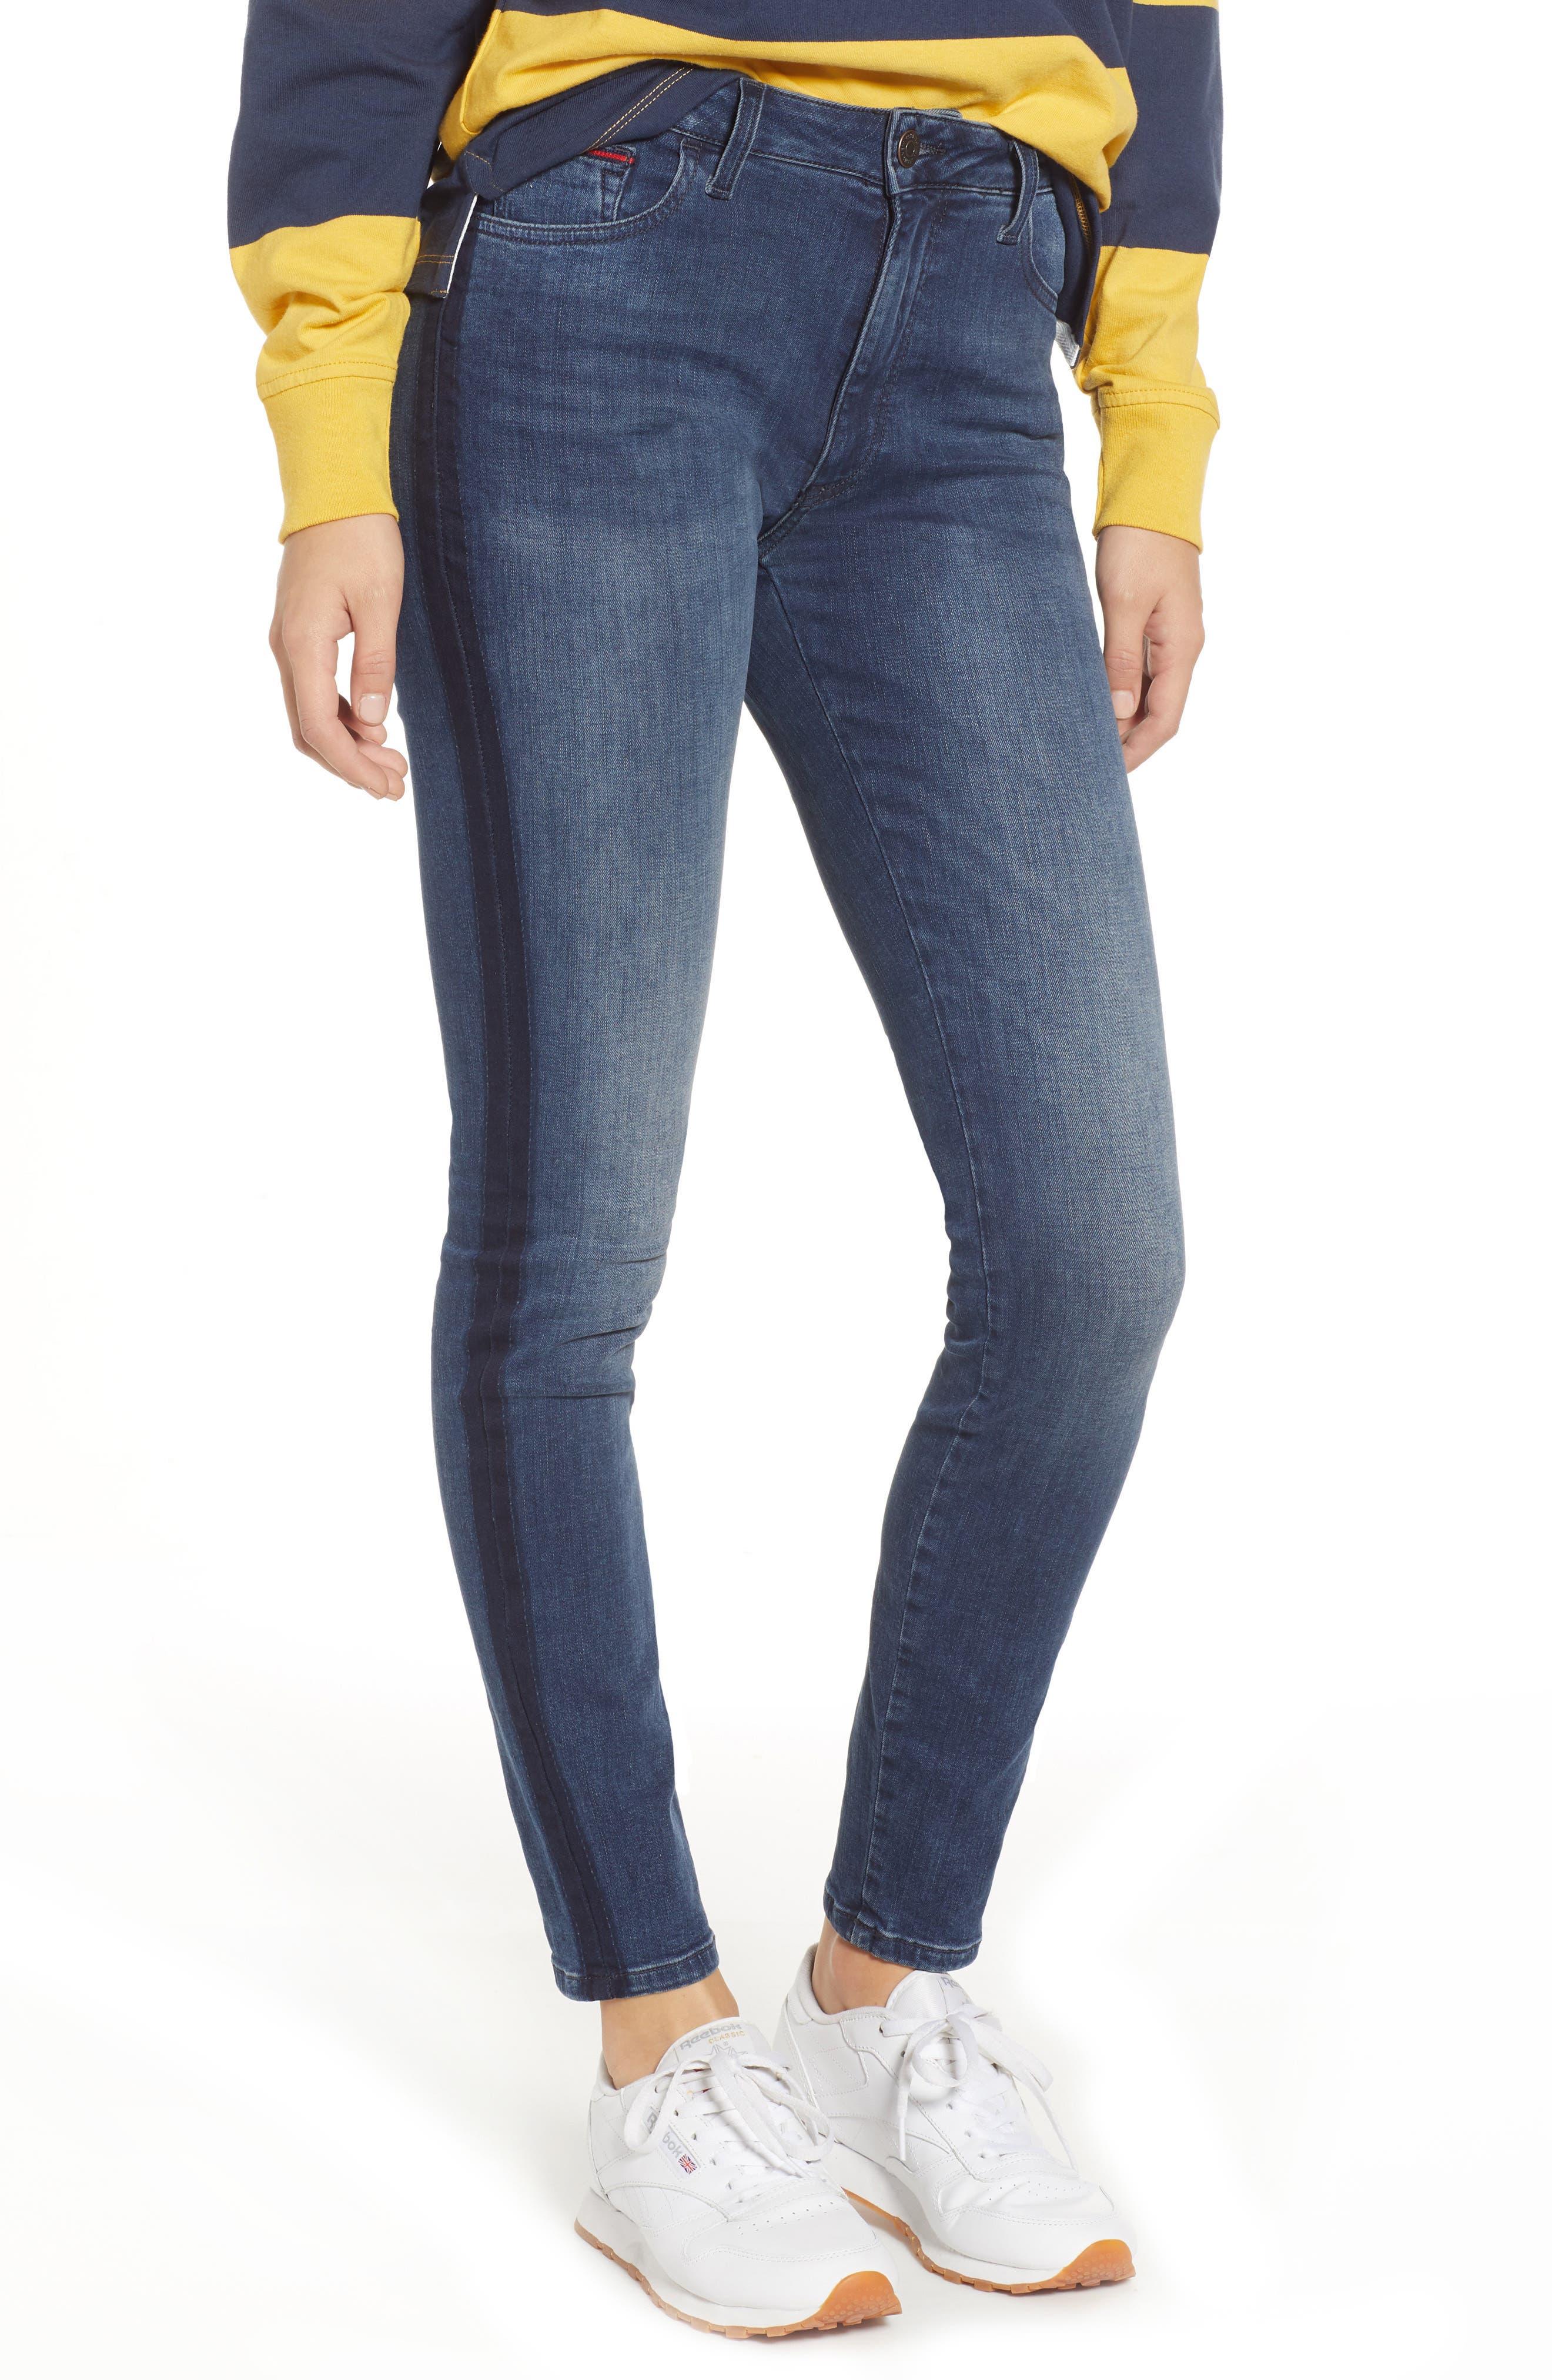 Santana High Waist Skinny Jeans,                             Main thumbnail 1, color,                             NEDDLE DARK BLUE STRETCH